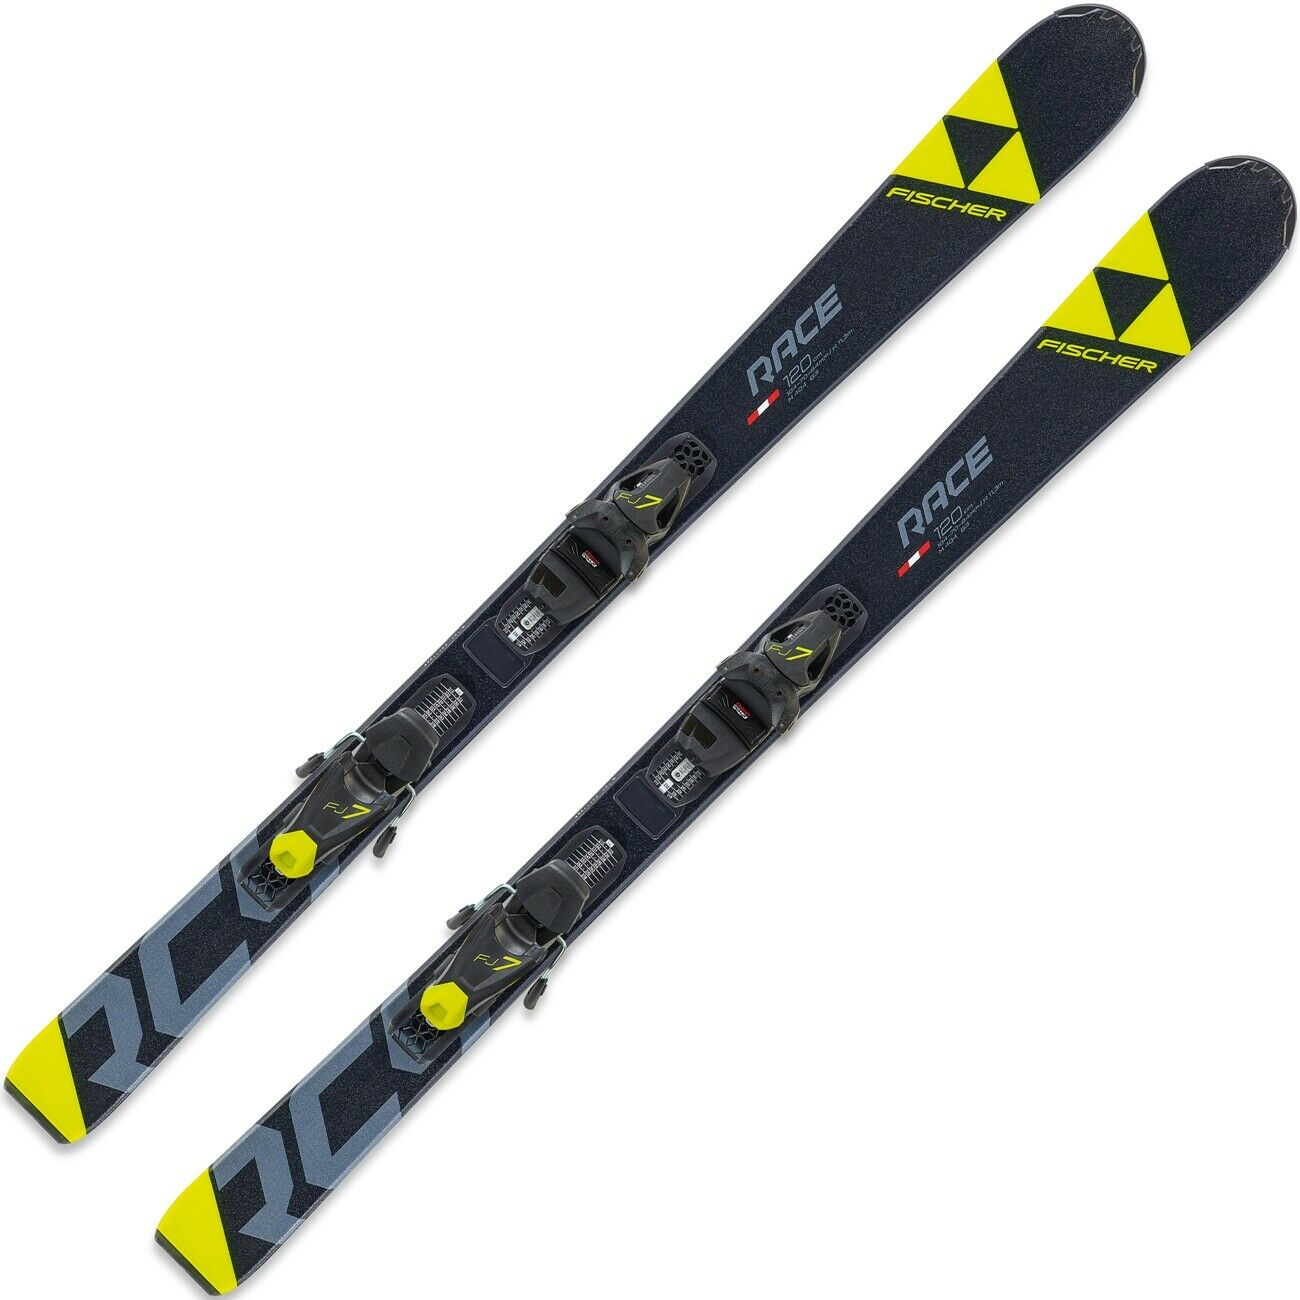 Fischer RC4 Race Jr  Ski Kinder Ski  Saison 2019 20 (100975)